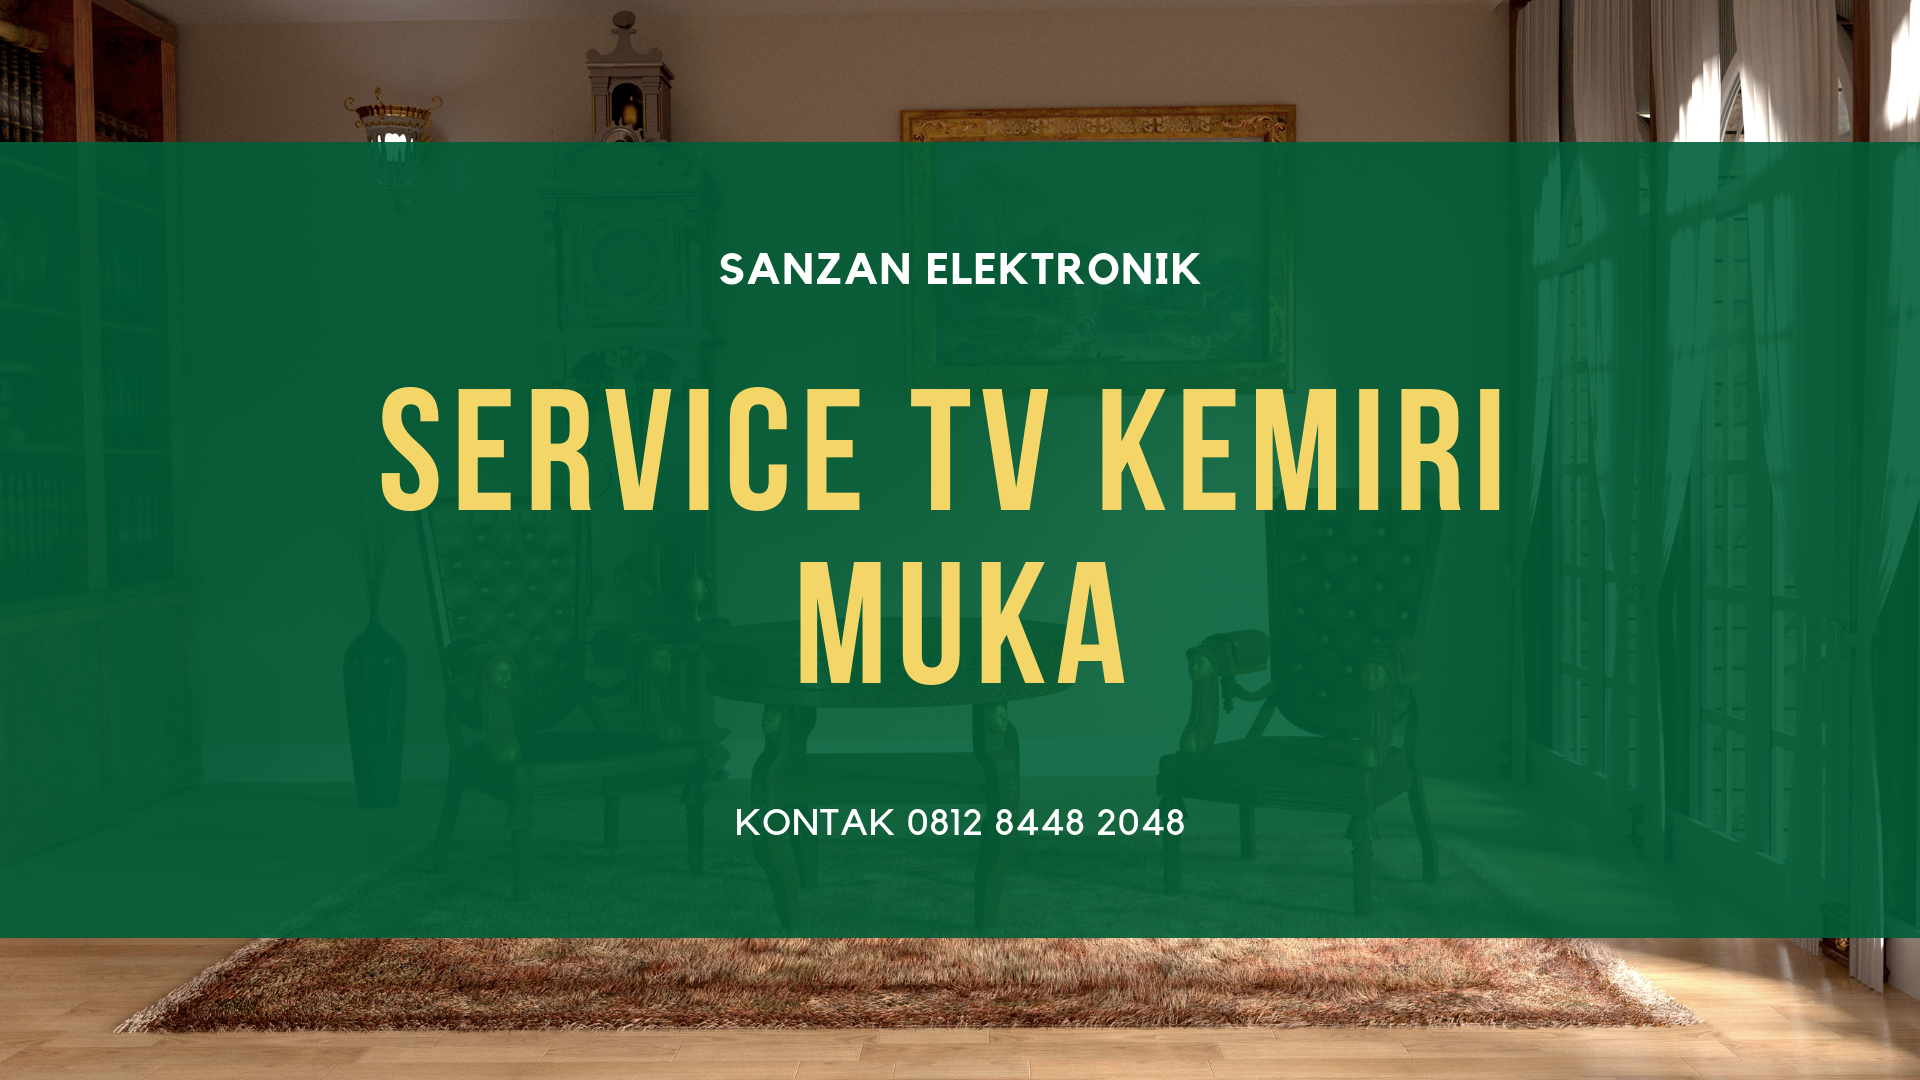 Service TV Kemiri Muka